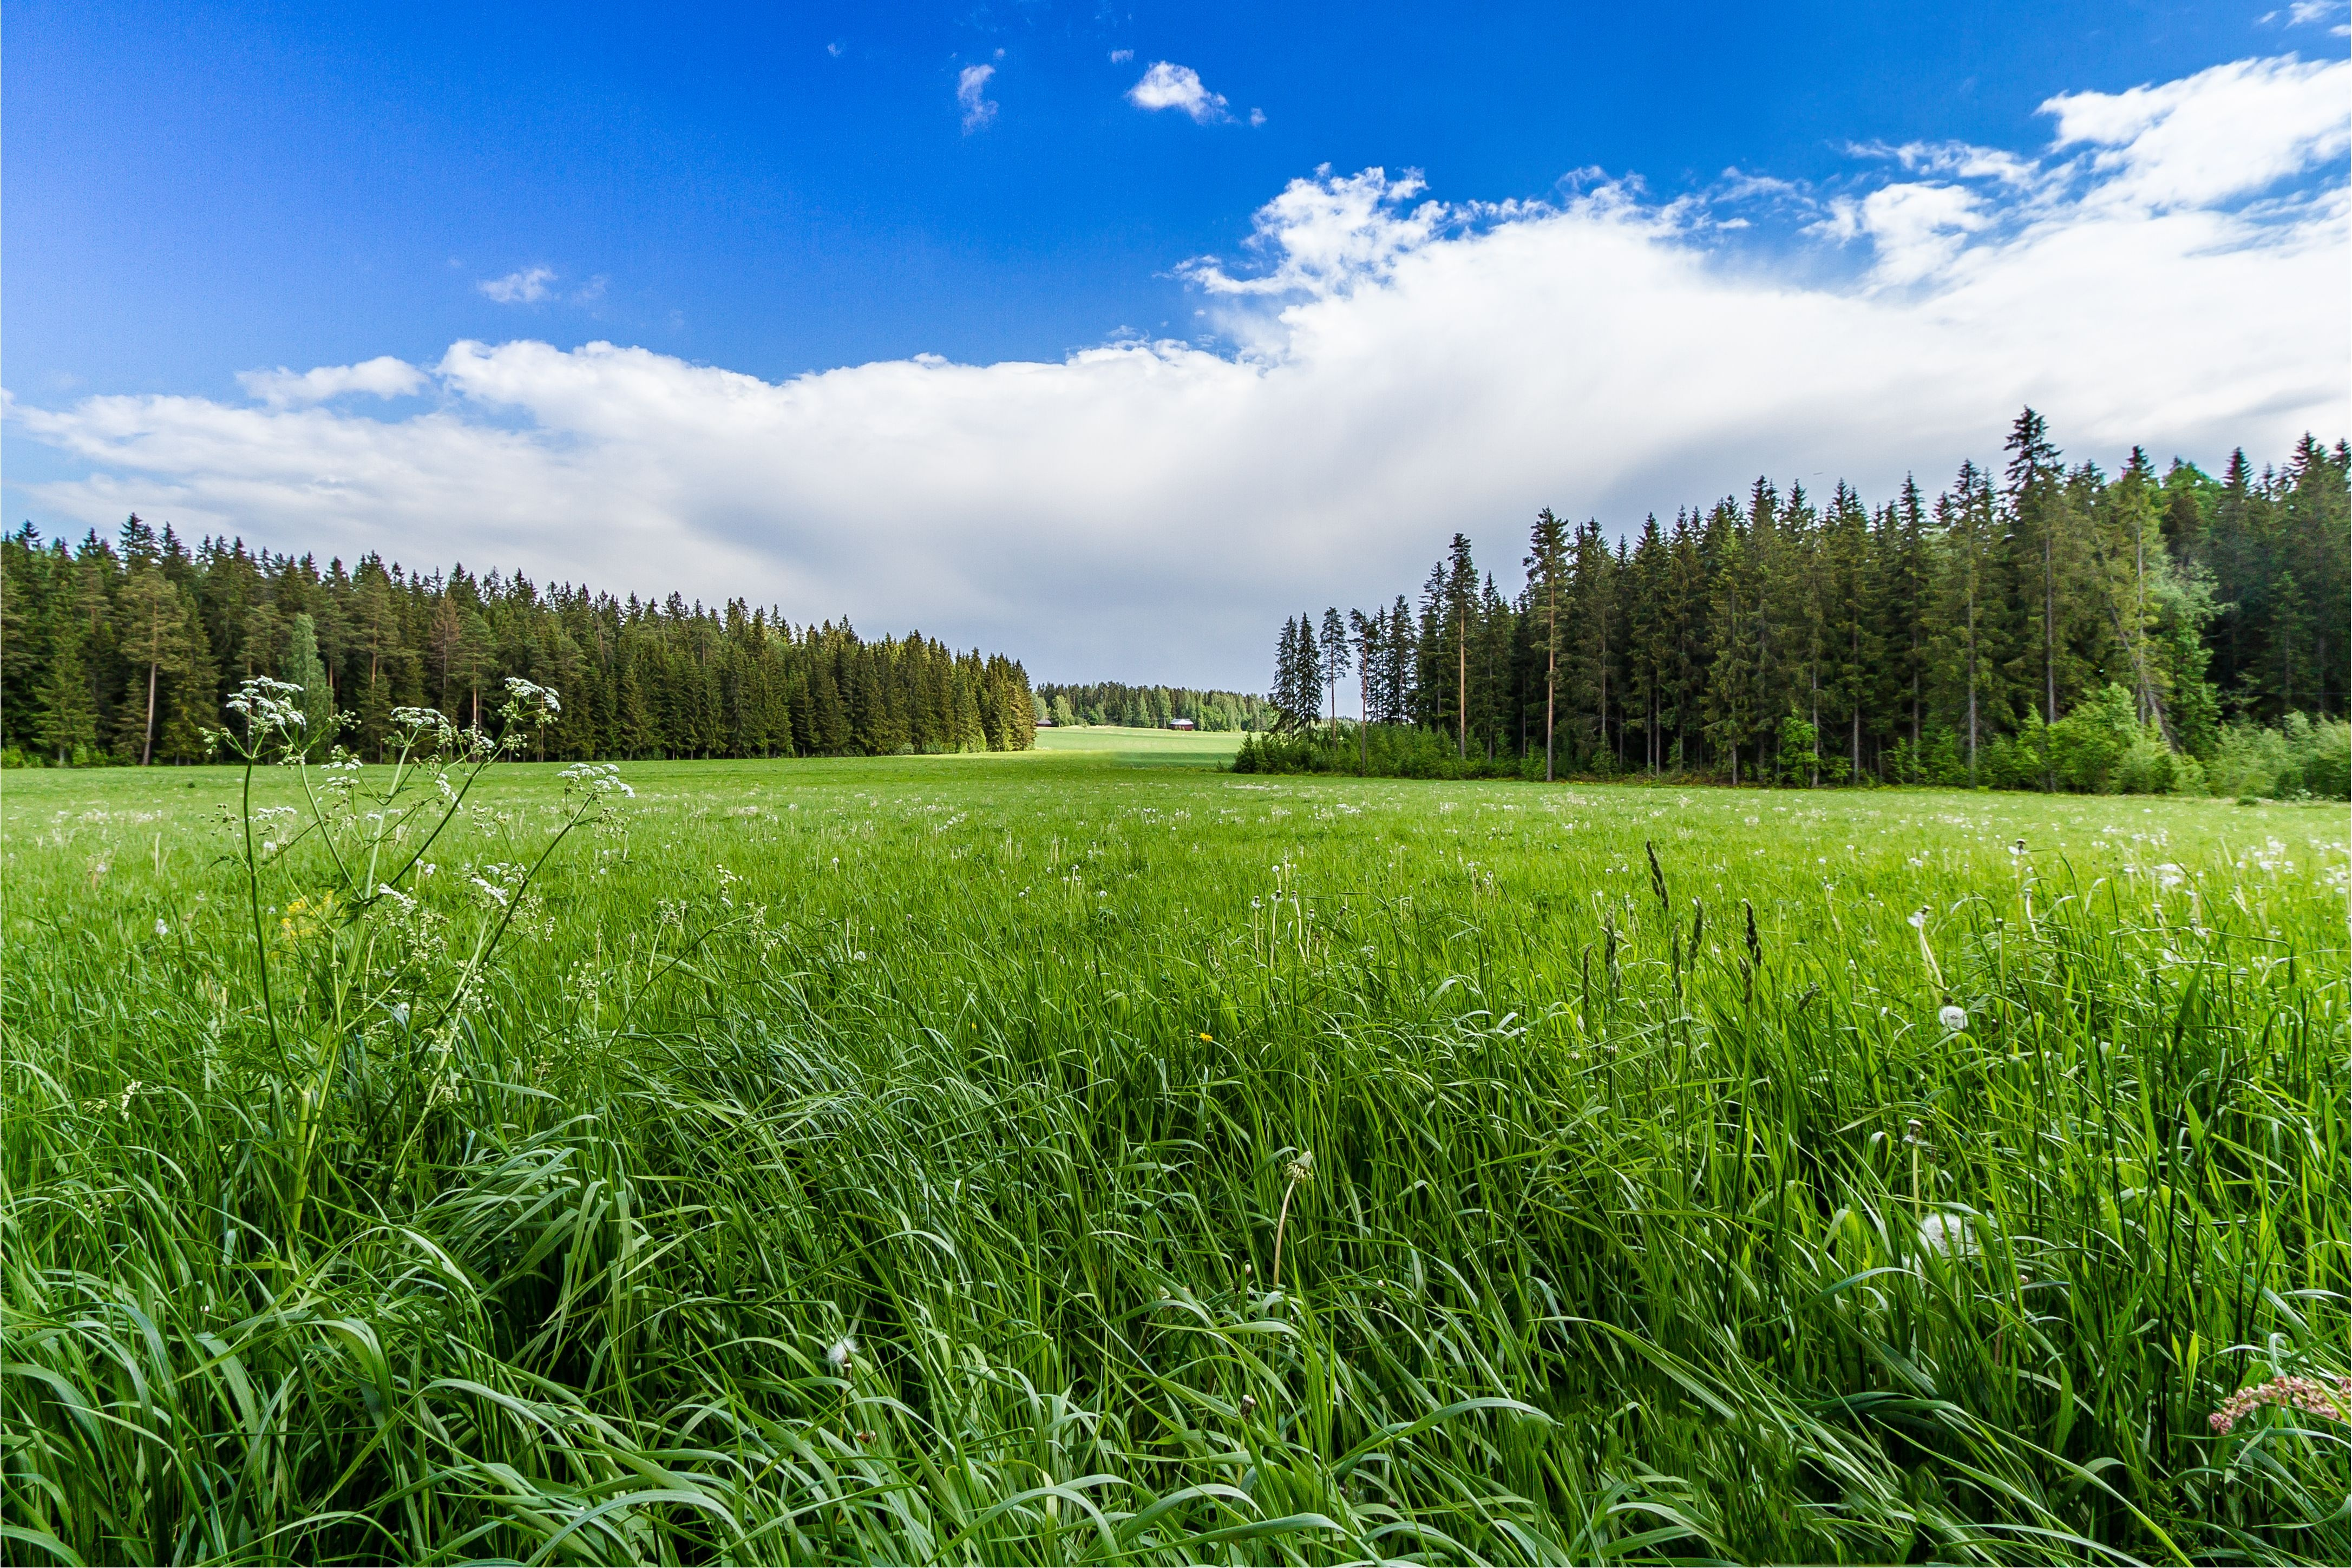 Field grass forest trees sky landscape r wallpaper | 4345x2897 ...